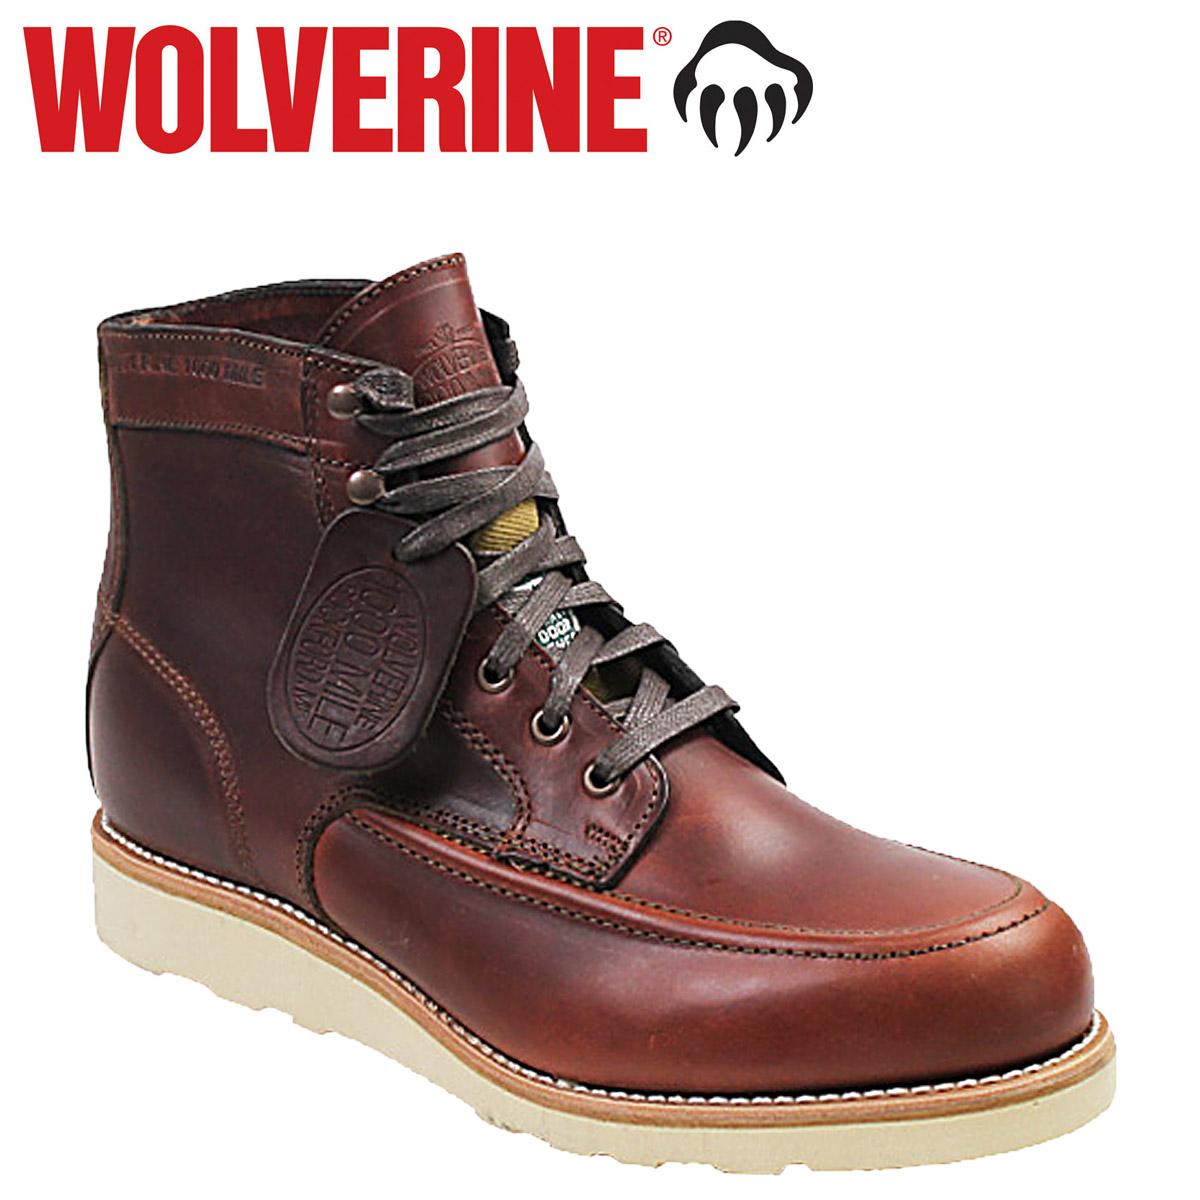 46419a339e8 WOLVERINE×FILSON Wolverine 1000 mile Emerson wedge  last  1000 MILE EMERSON  WEDGE leather mens boots BOOTS Filson W00283  4   5 new in stock   regular   ...